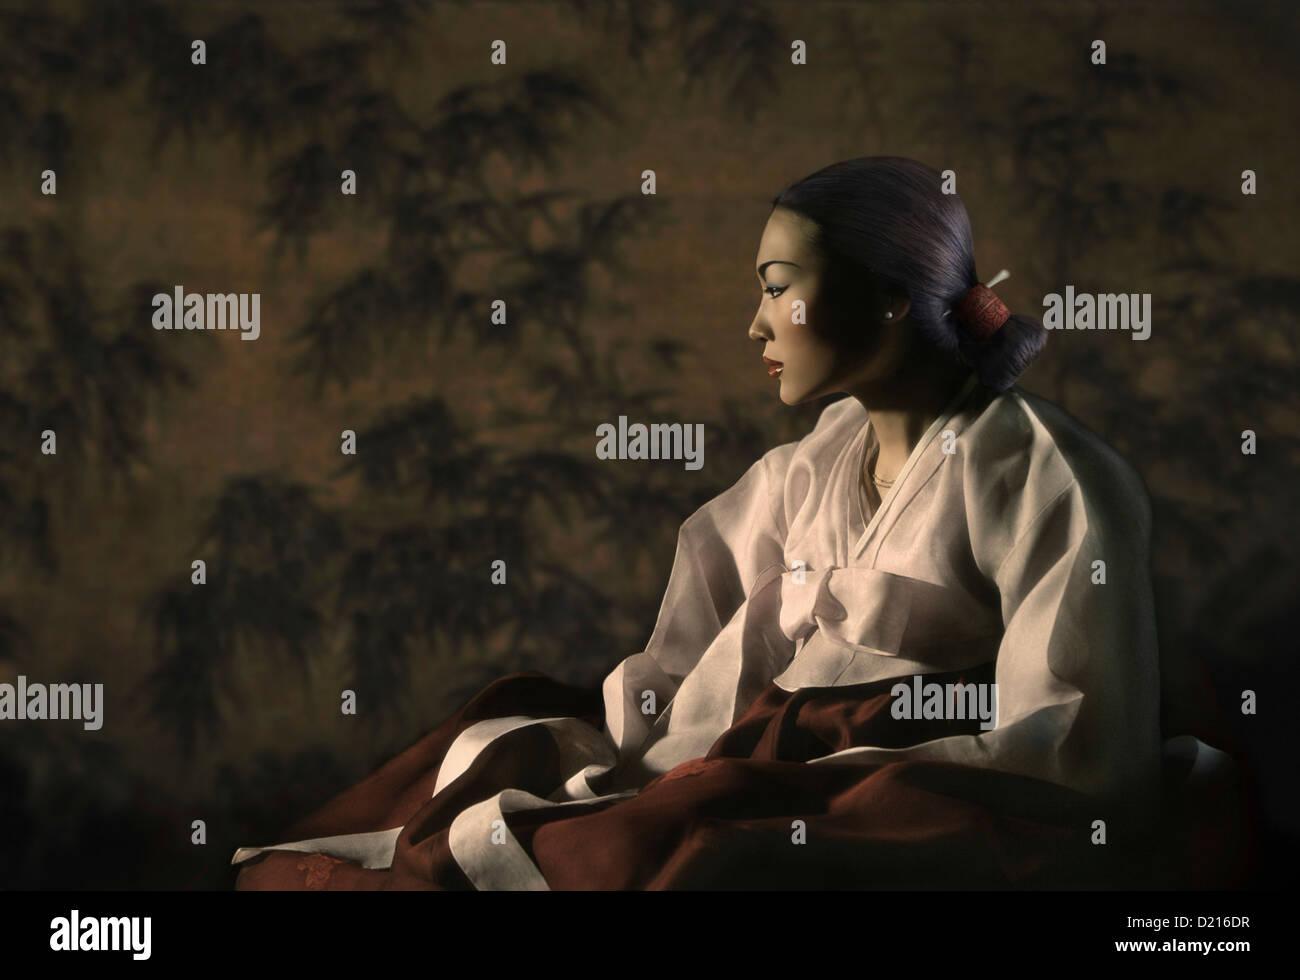 Young woman in a traditional Korean hanbok dress, Seoul, South Korea, Asia - Stock Image